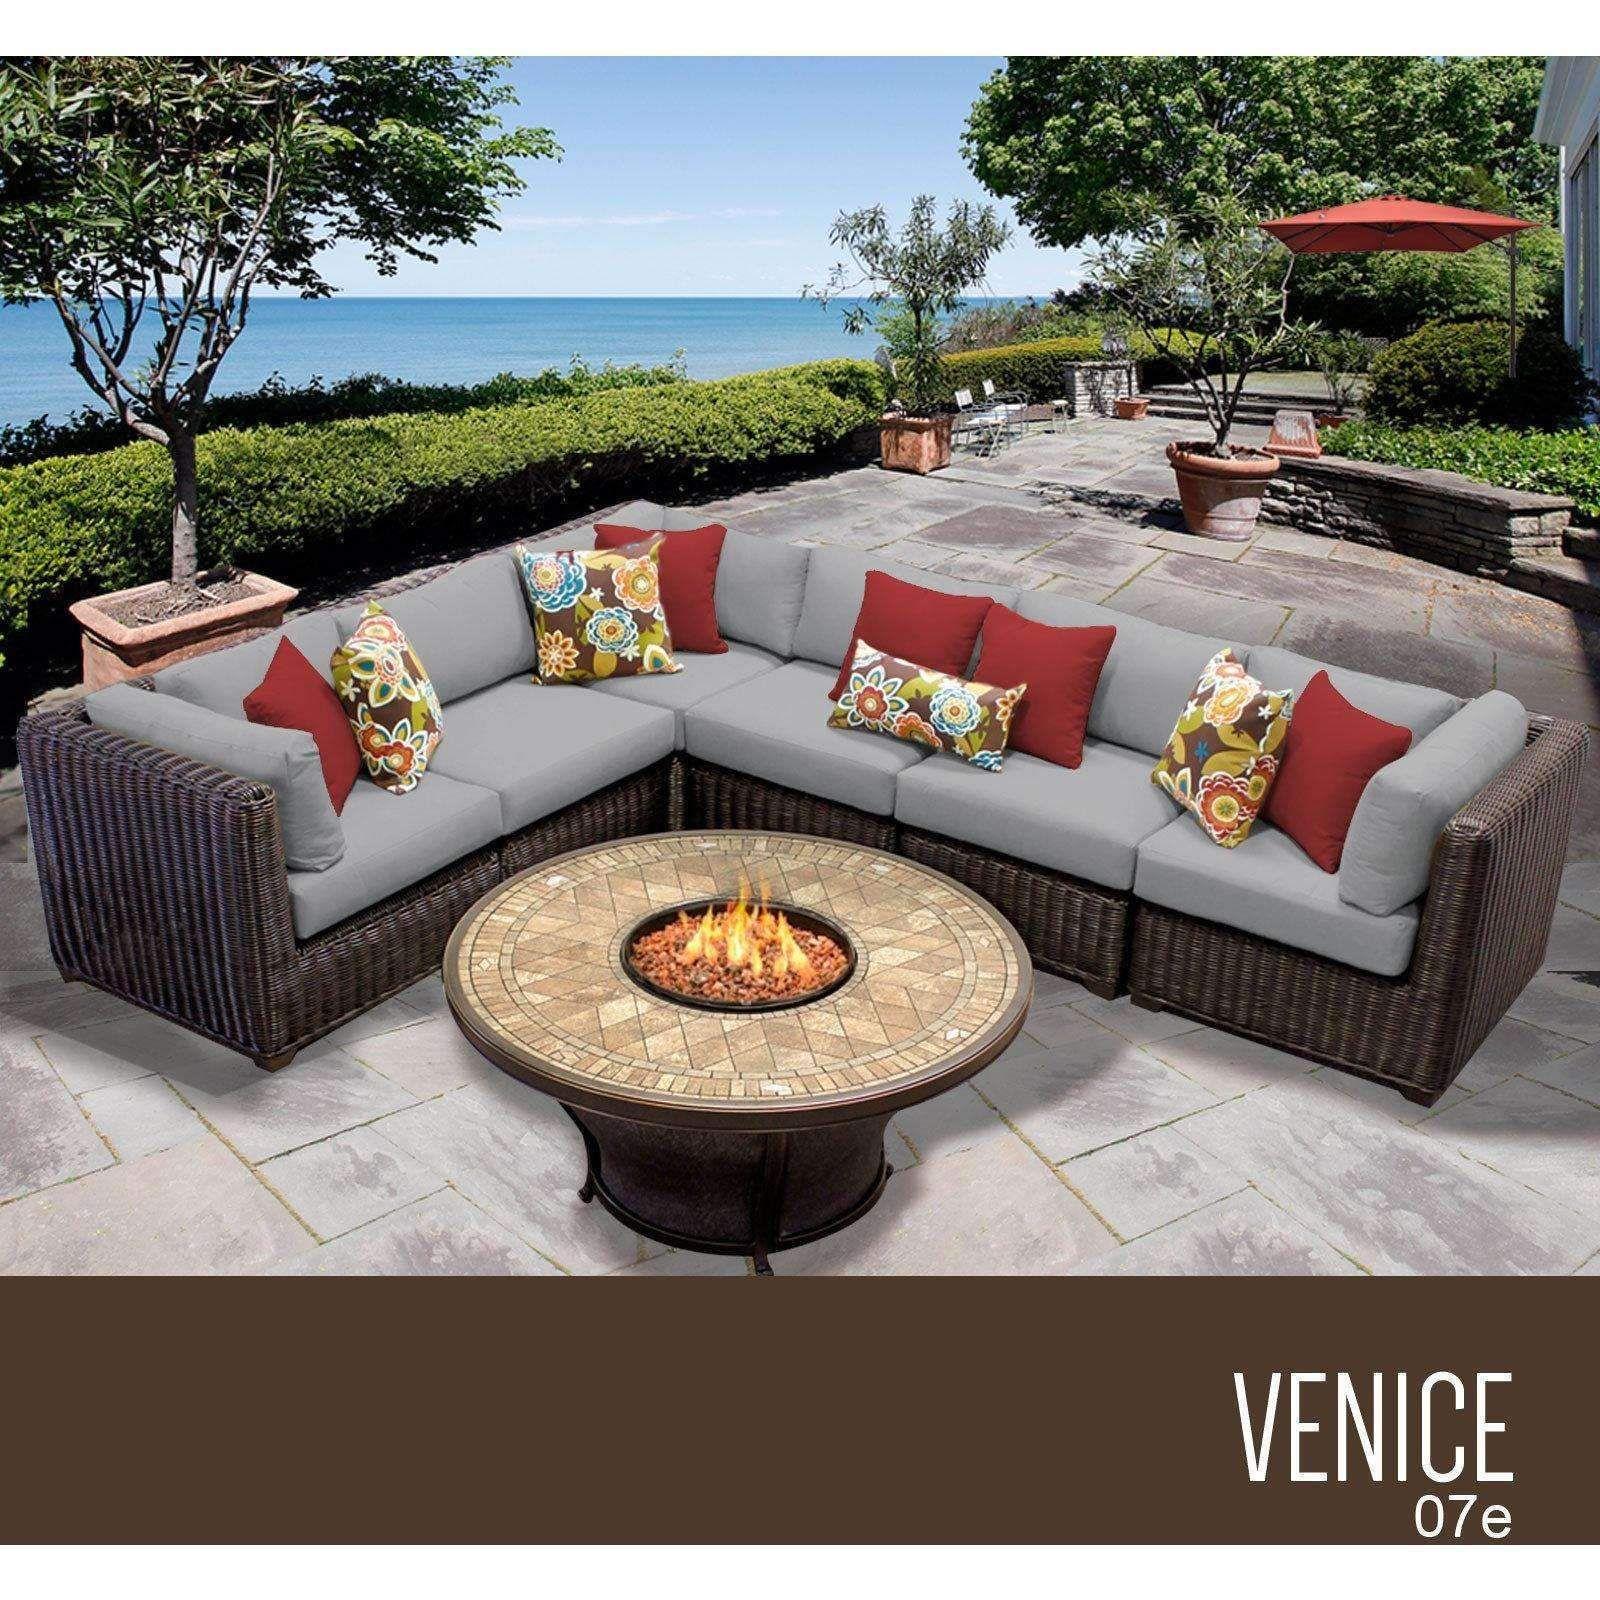 venice 7 piece outdoor wicker patio furniture set 07e products rh pinterest nz